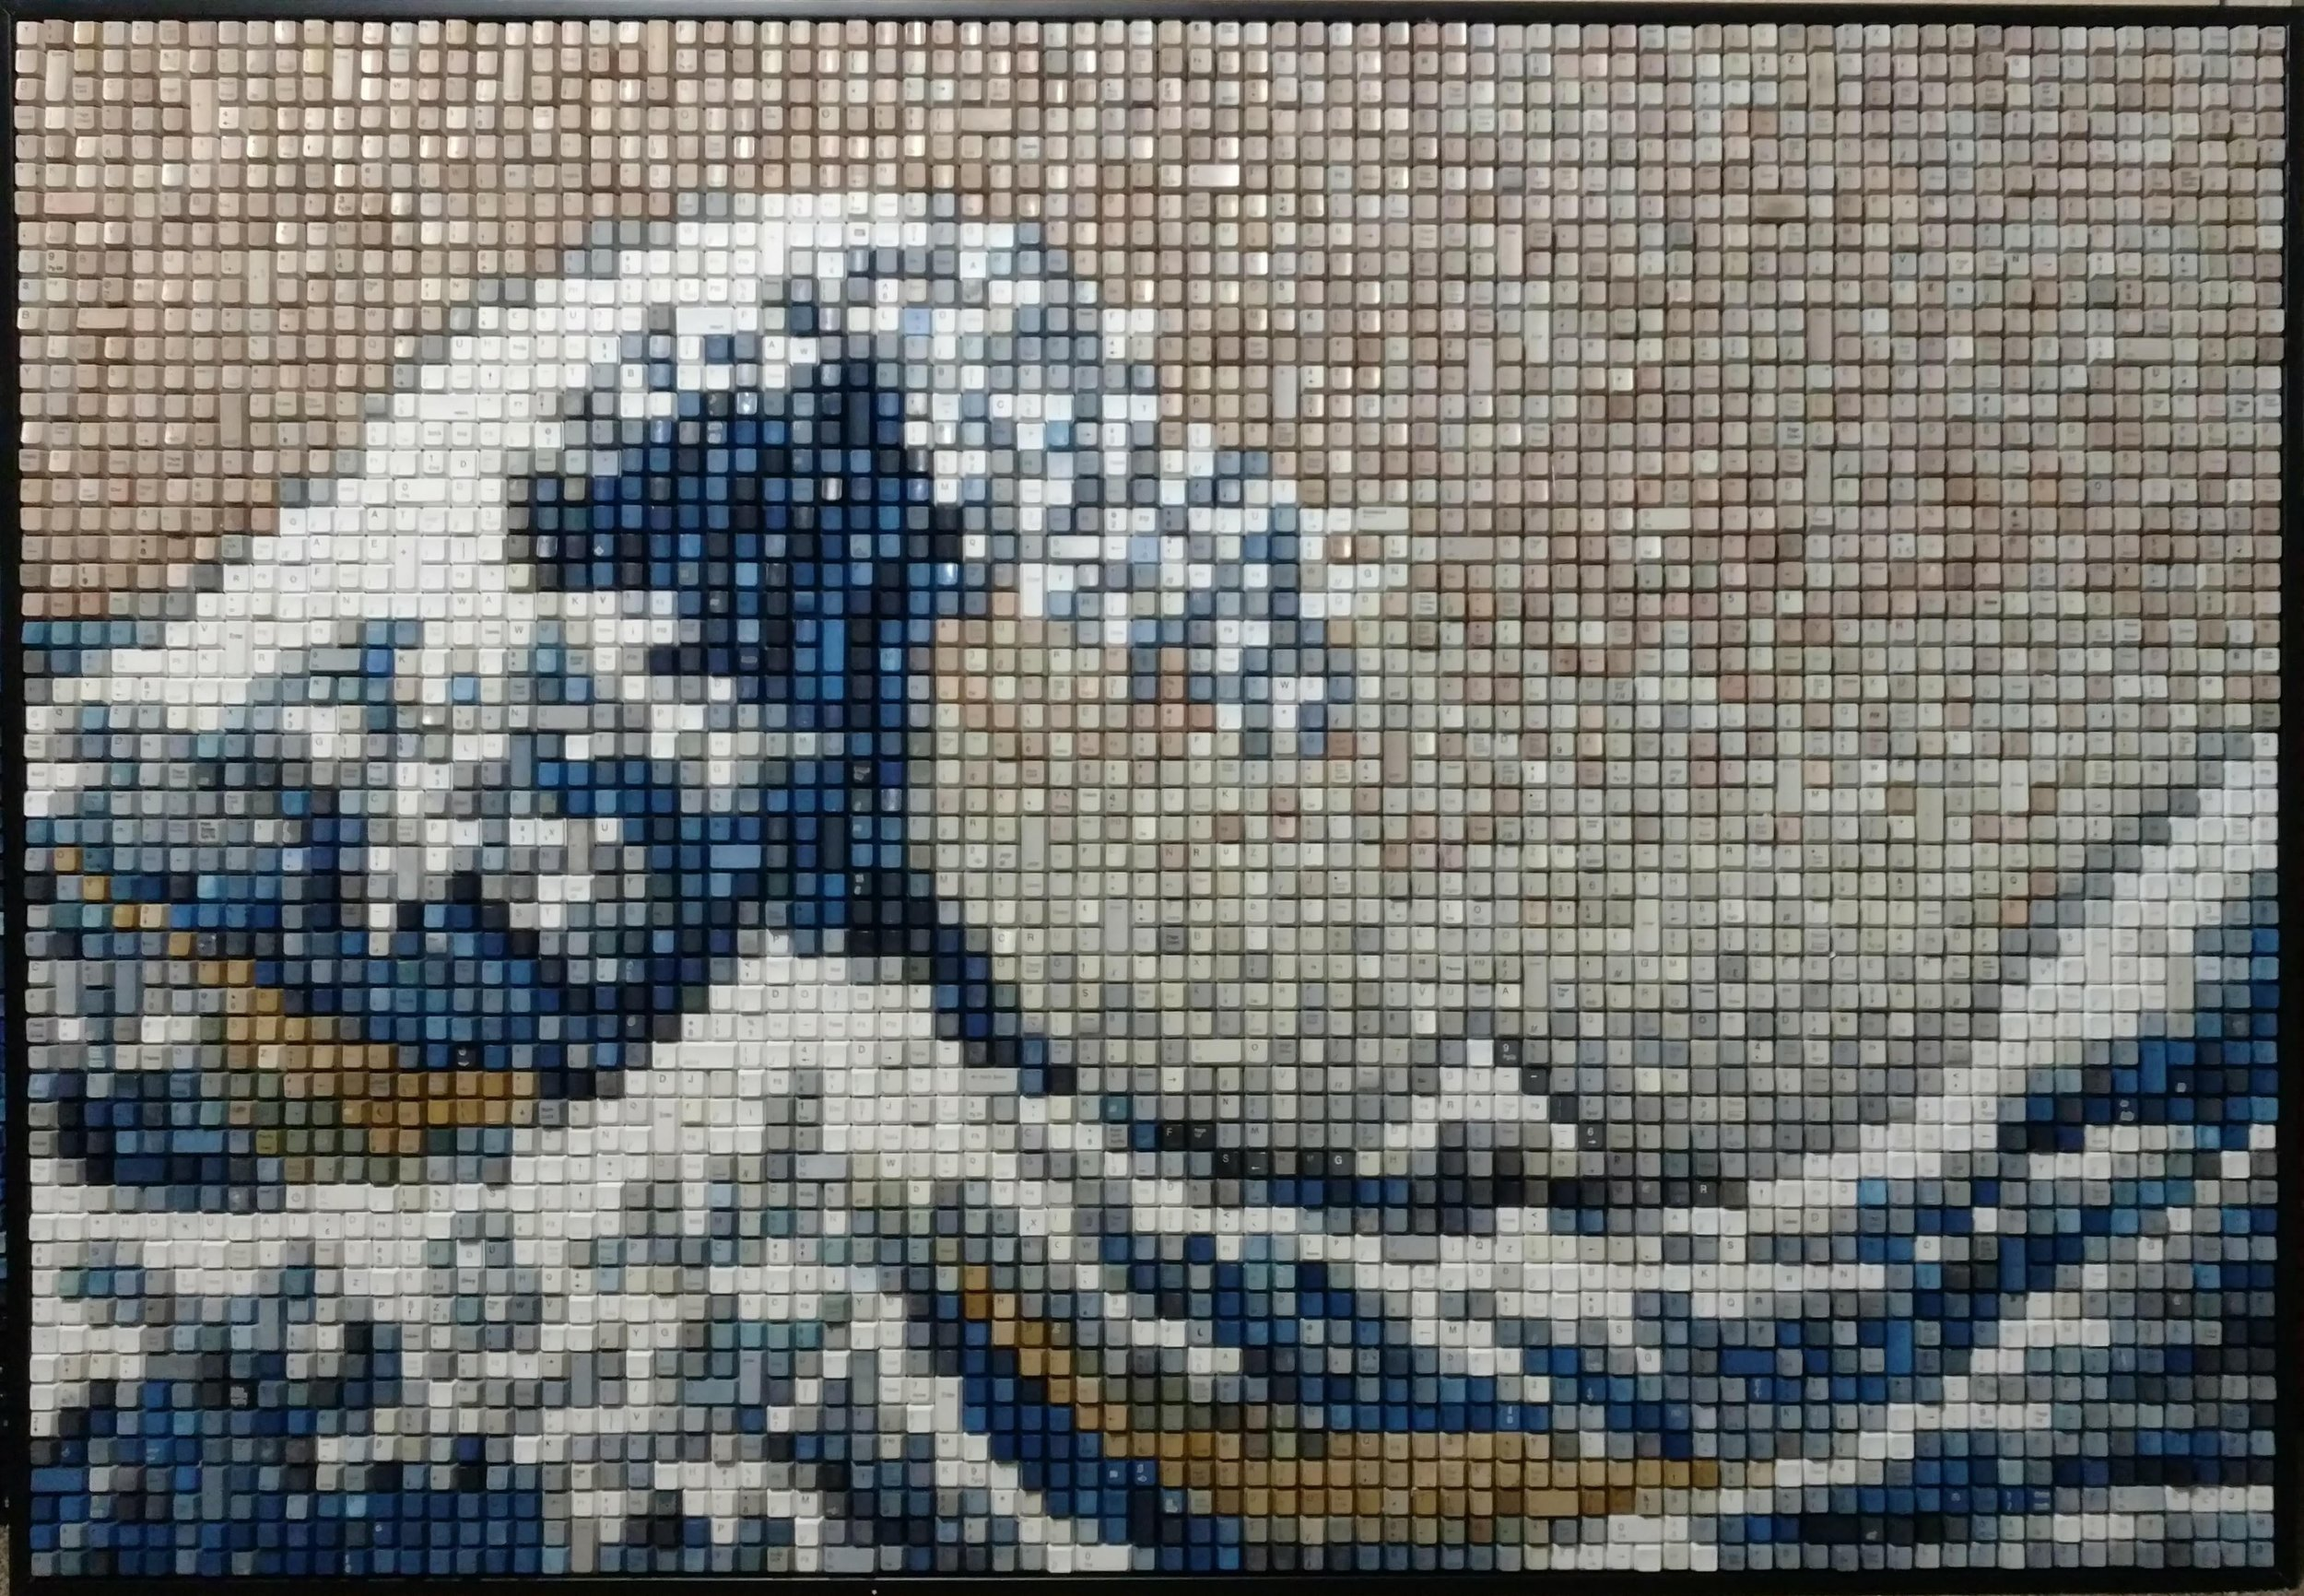 GREAT WAVE  | 40 X 58 in   ORIGINAL  |  PRINTS